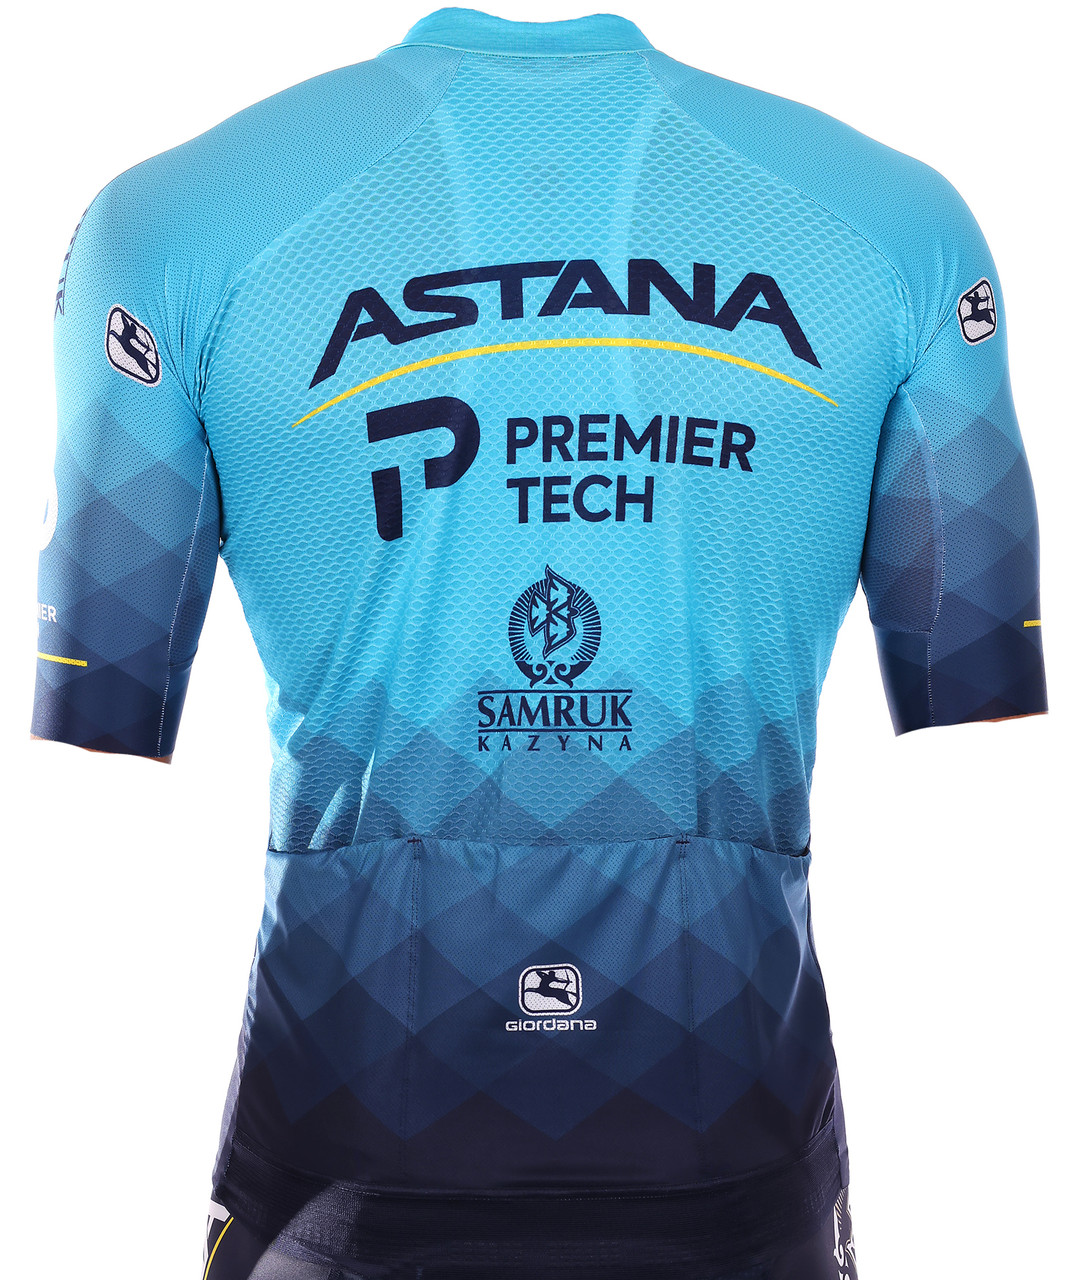 2021 Astana Premier Tech FR-C Pro FZ Jersey Rear